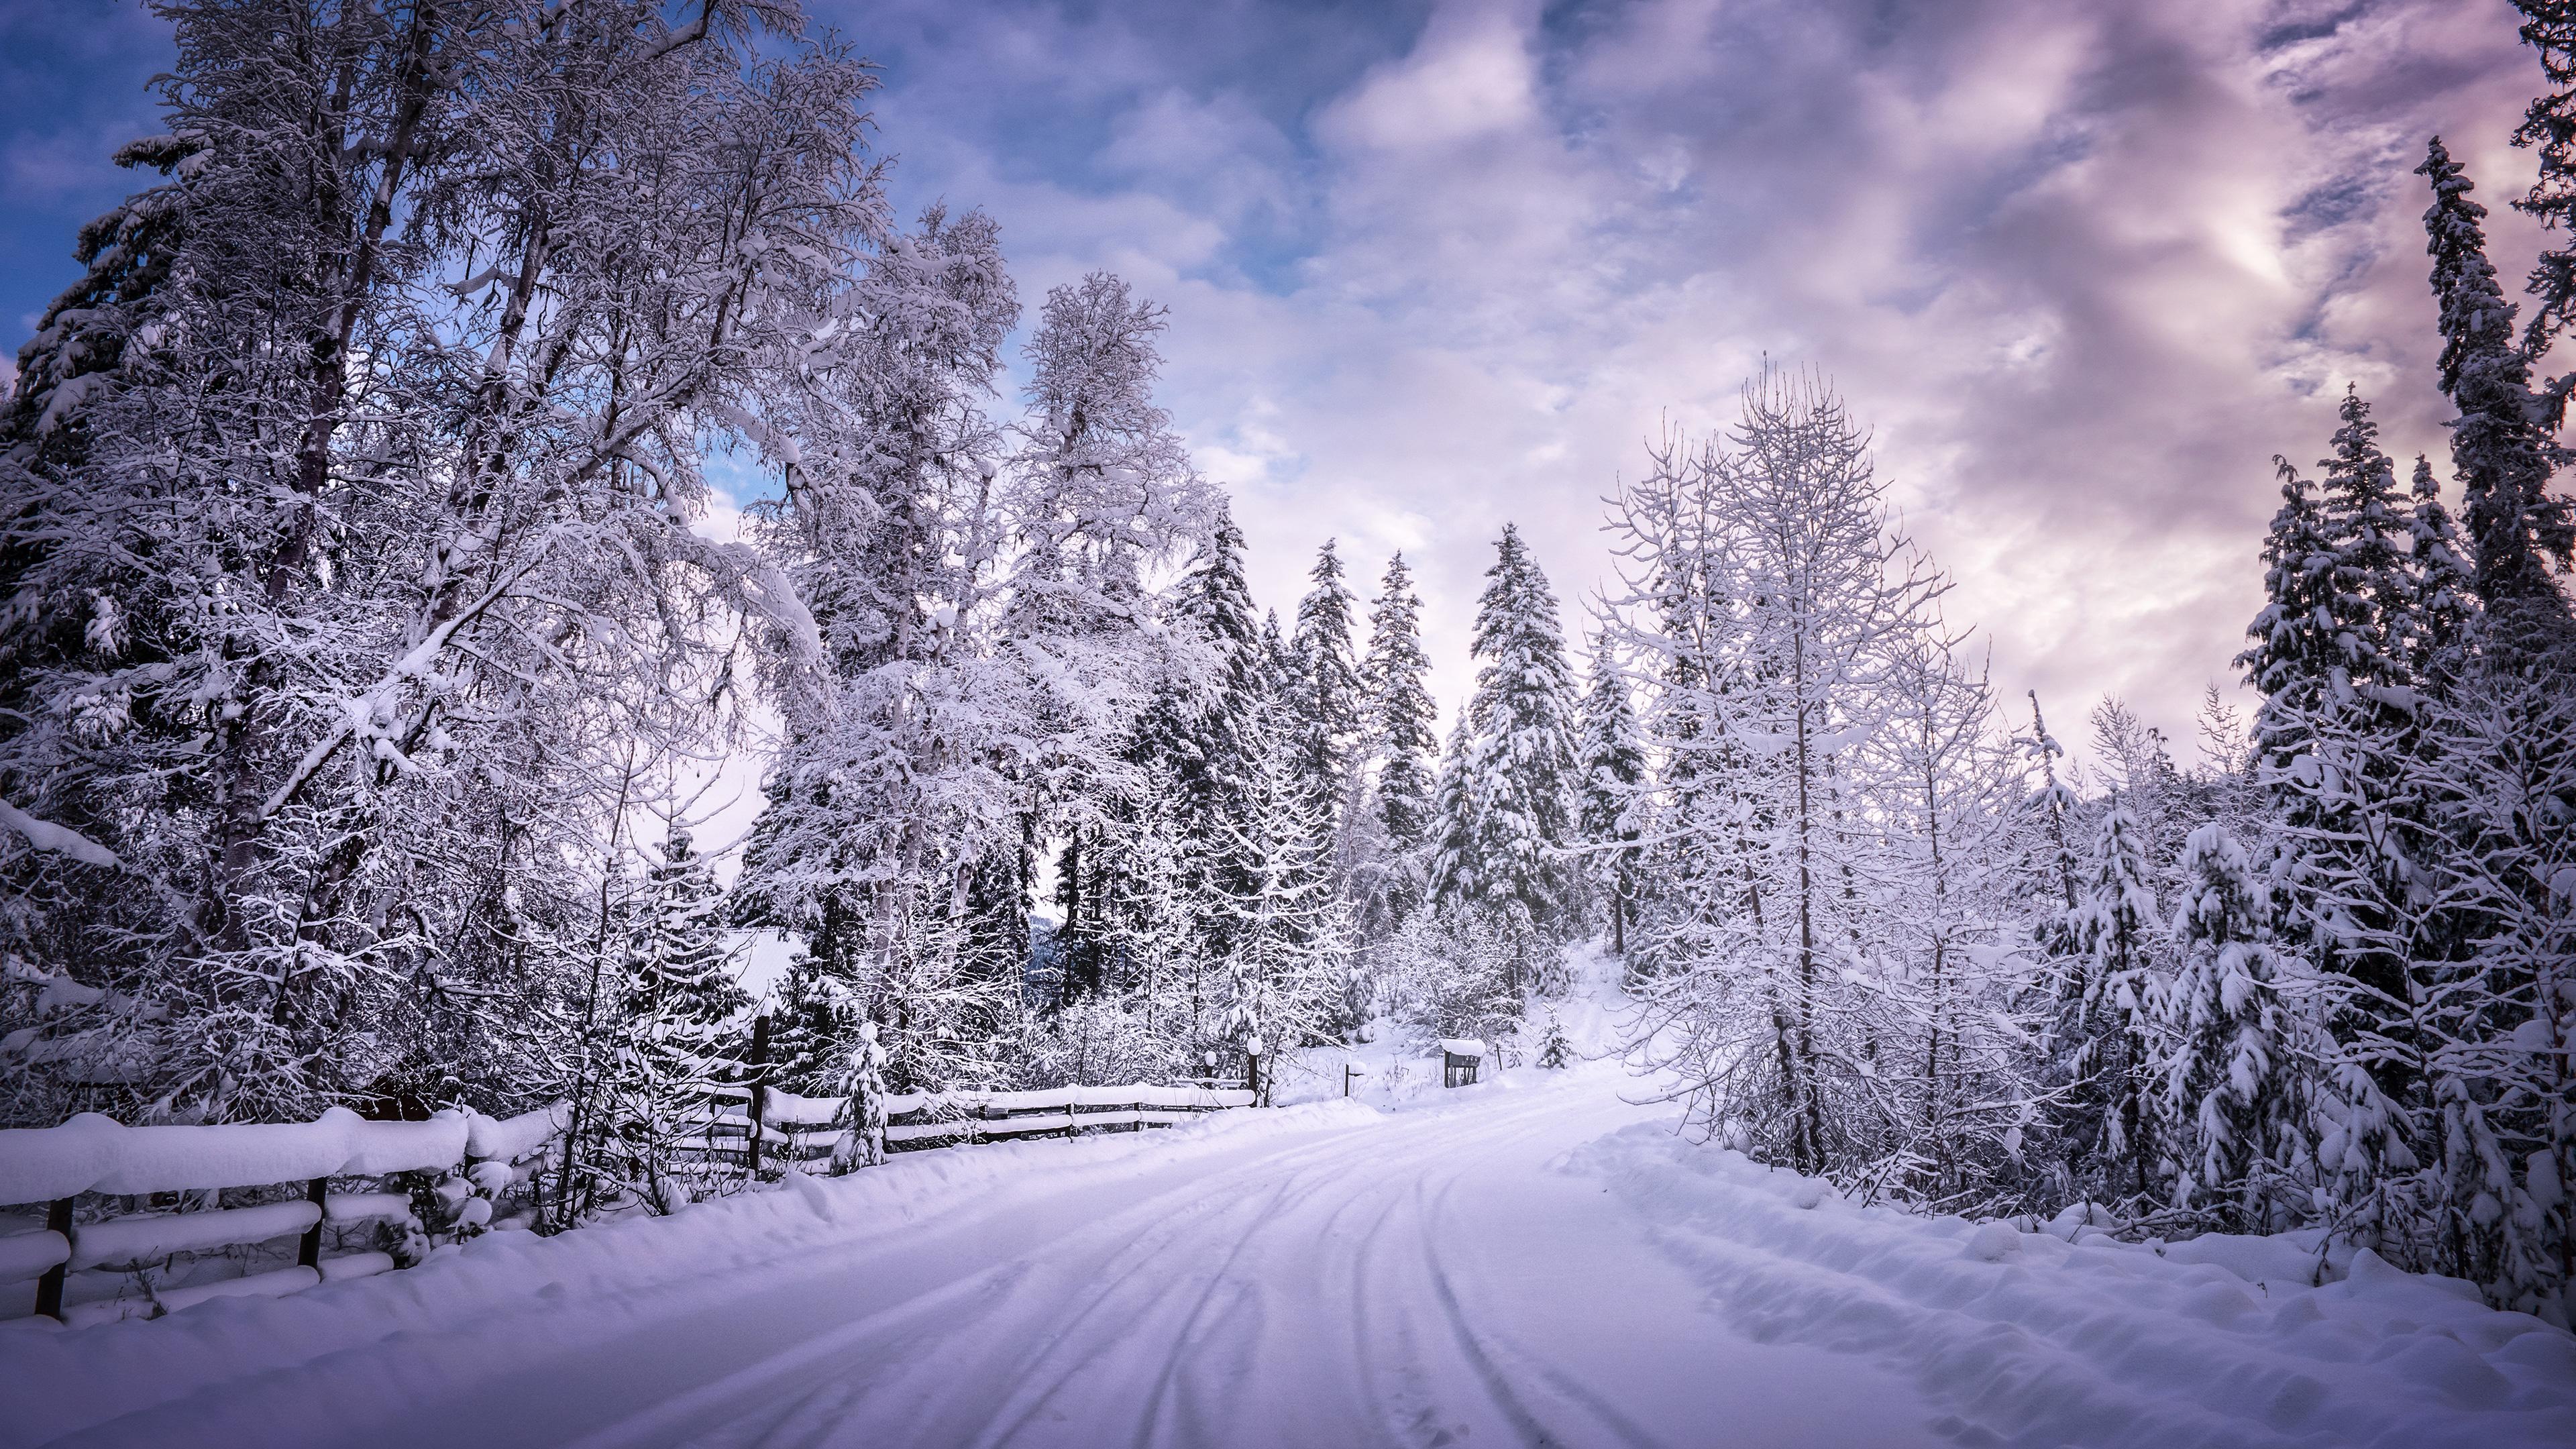 1680x1050 Winter Road Snow Trees White 1680x1050 Resolution